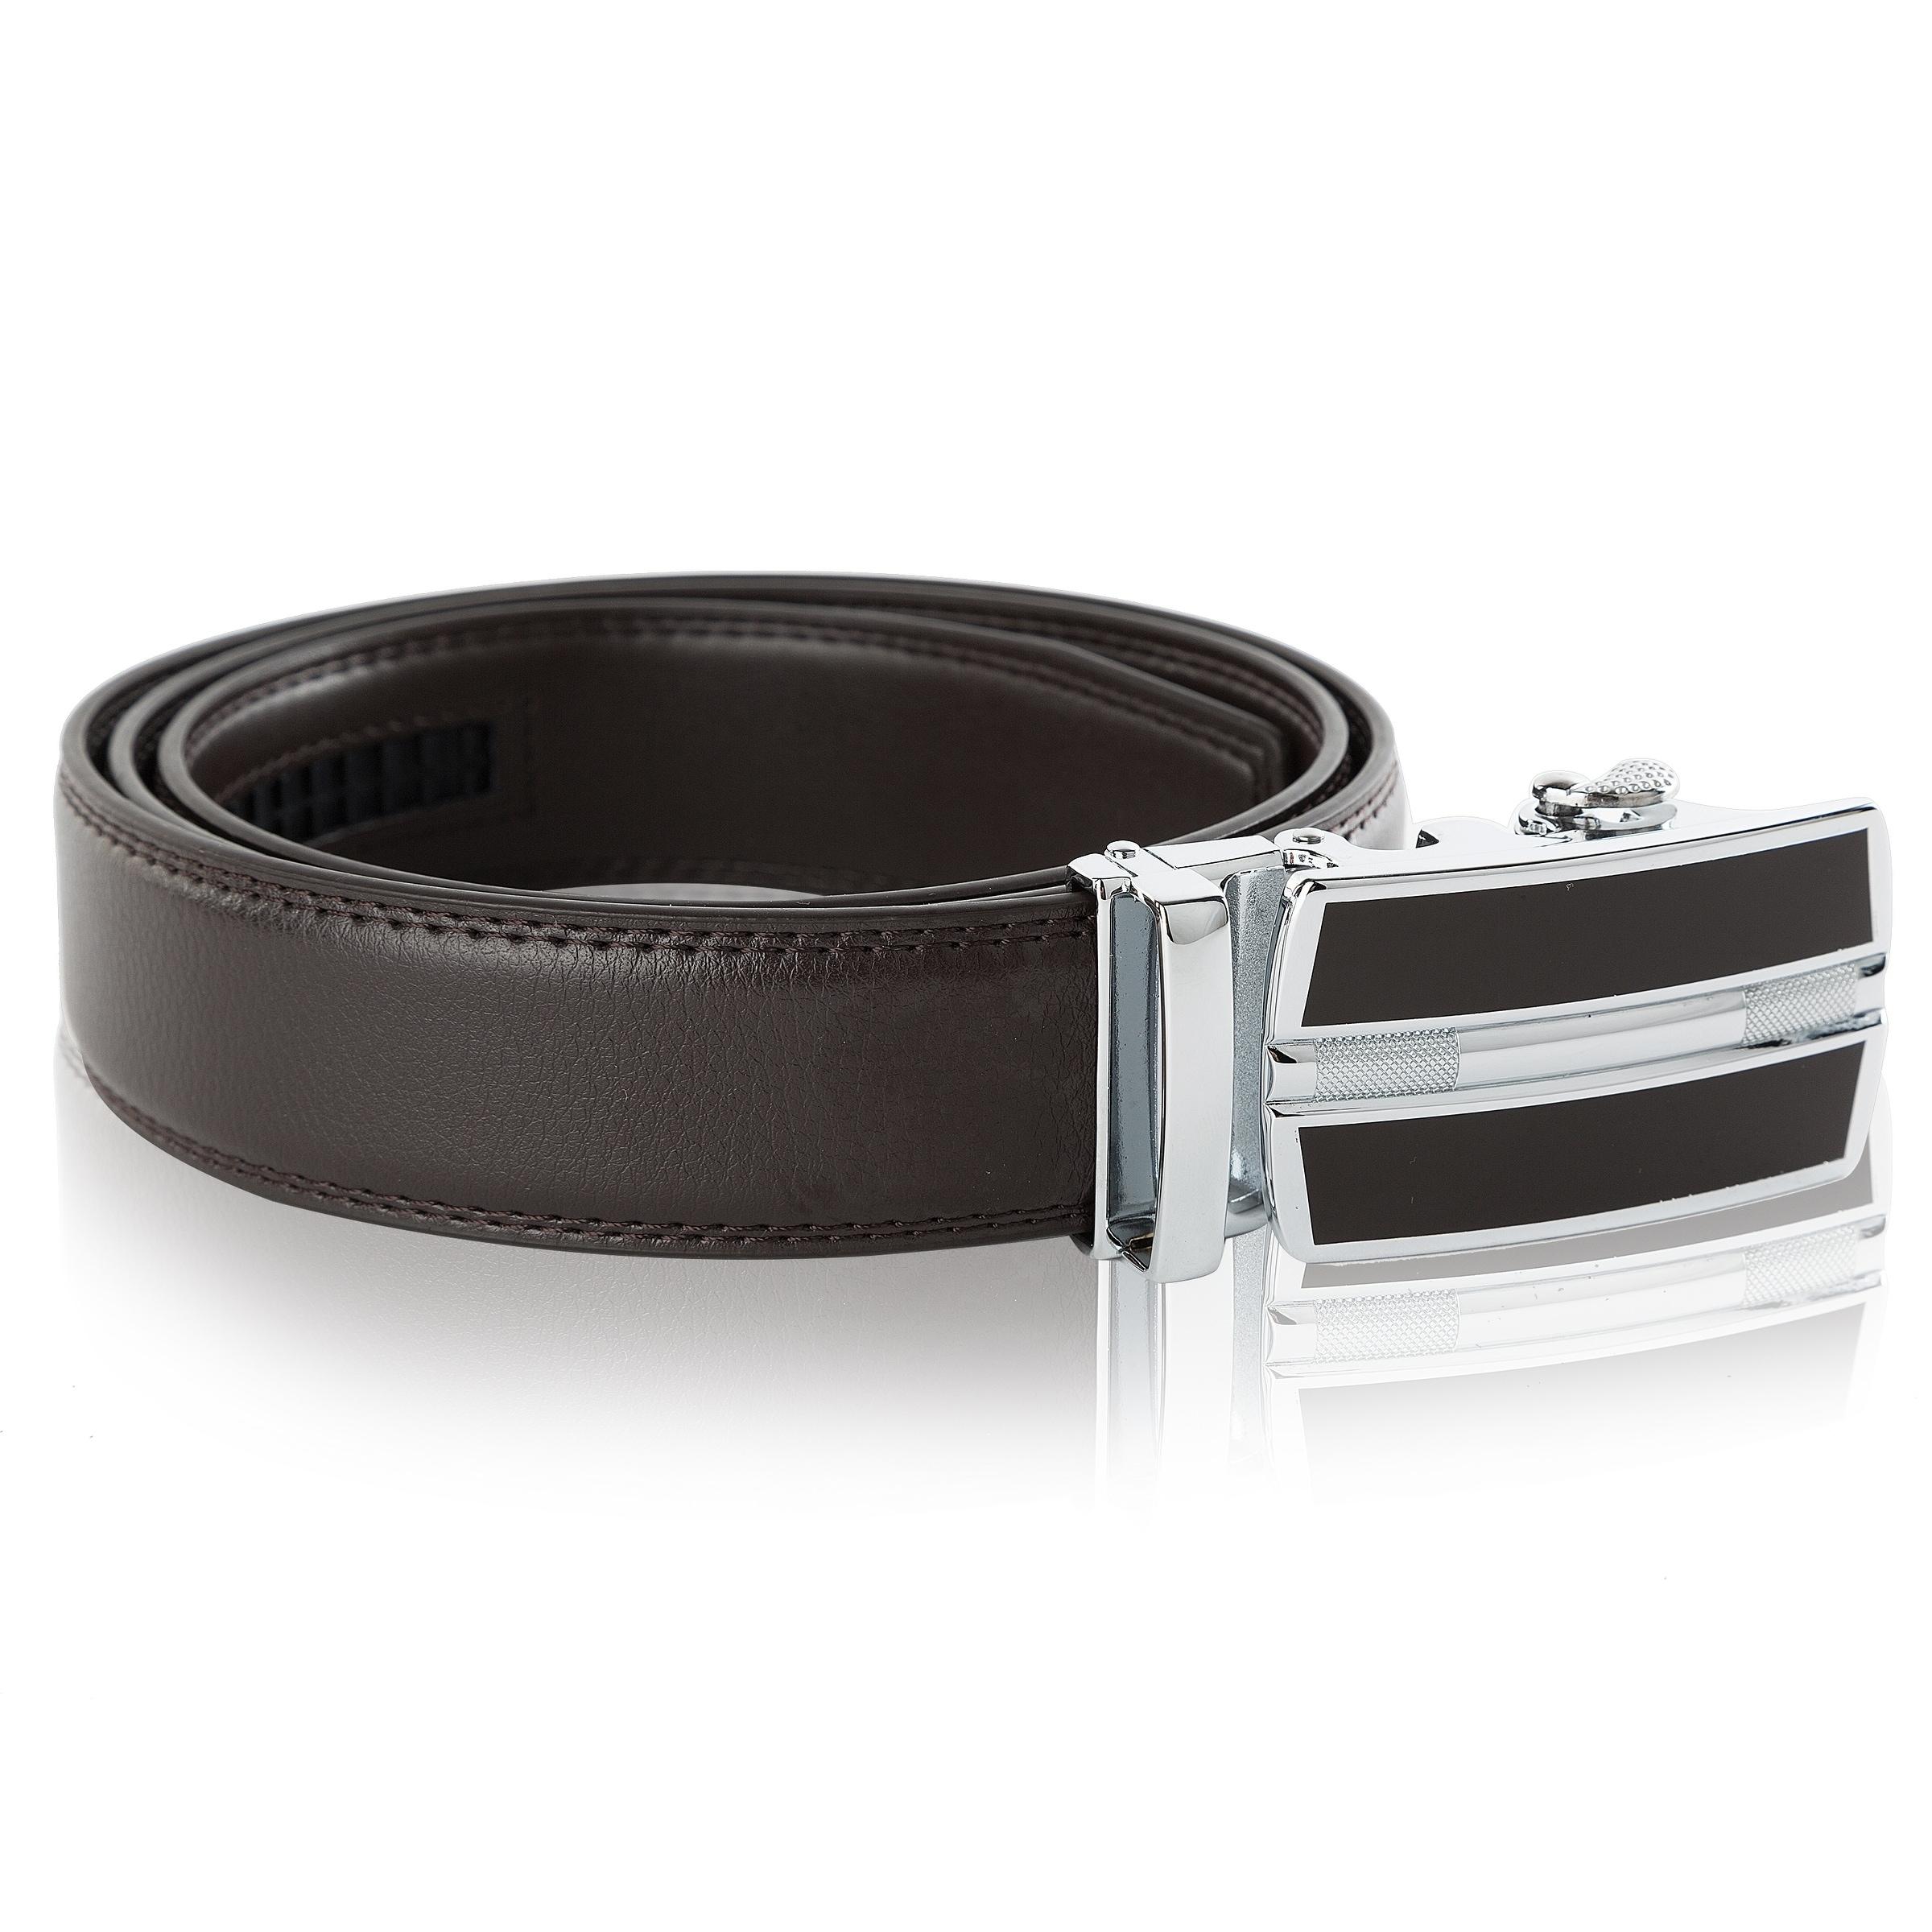 MKF Collection Analdo Genuine Leather Belt by Mia K Farrow